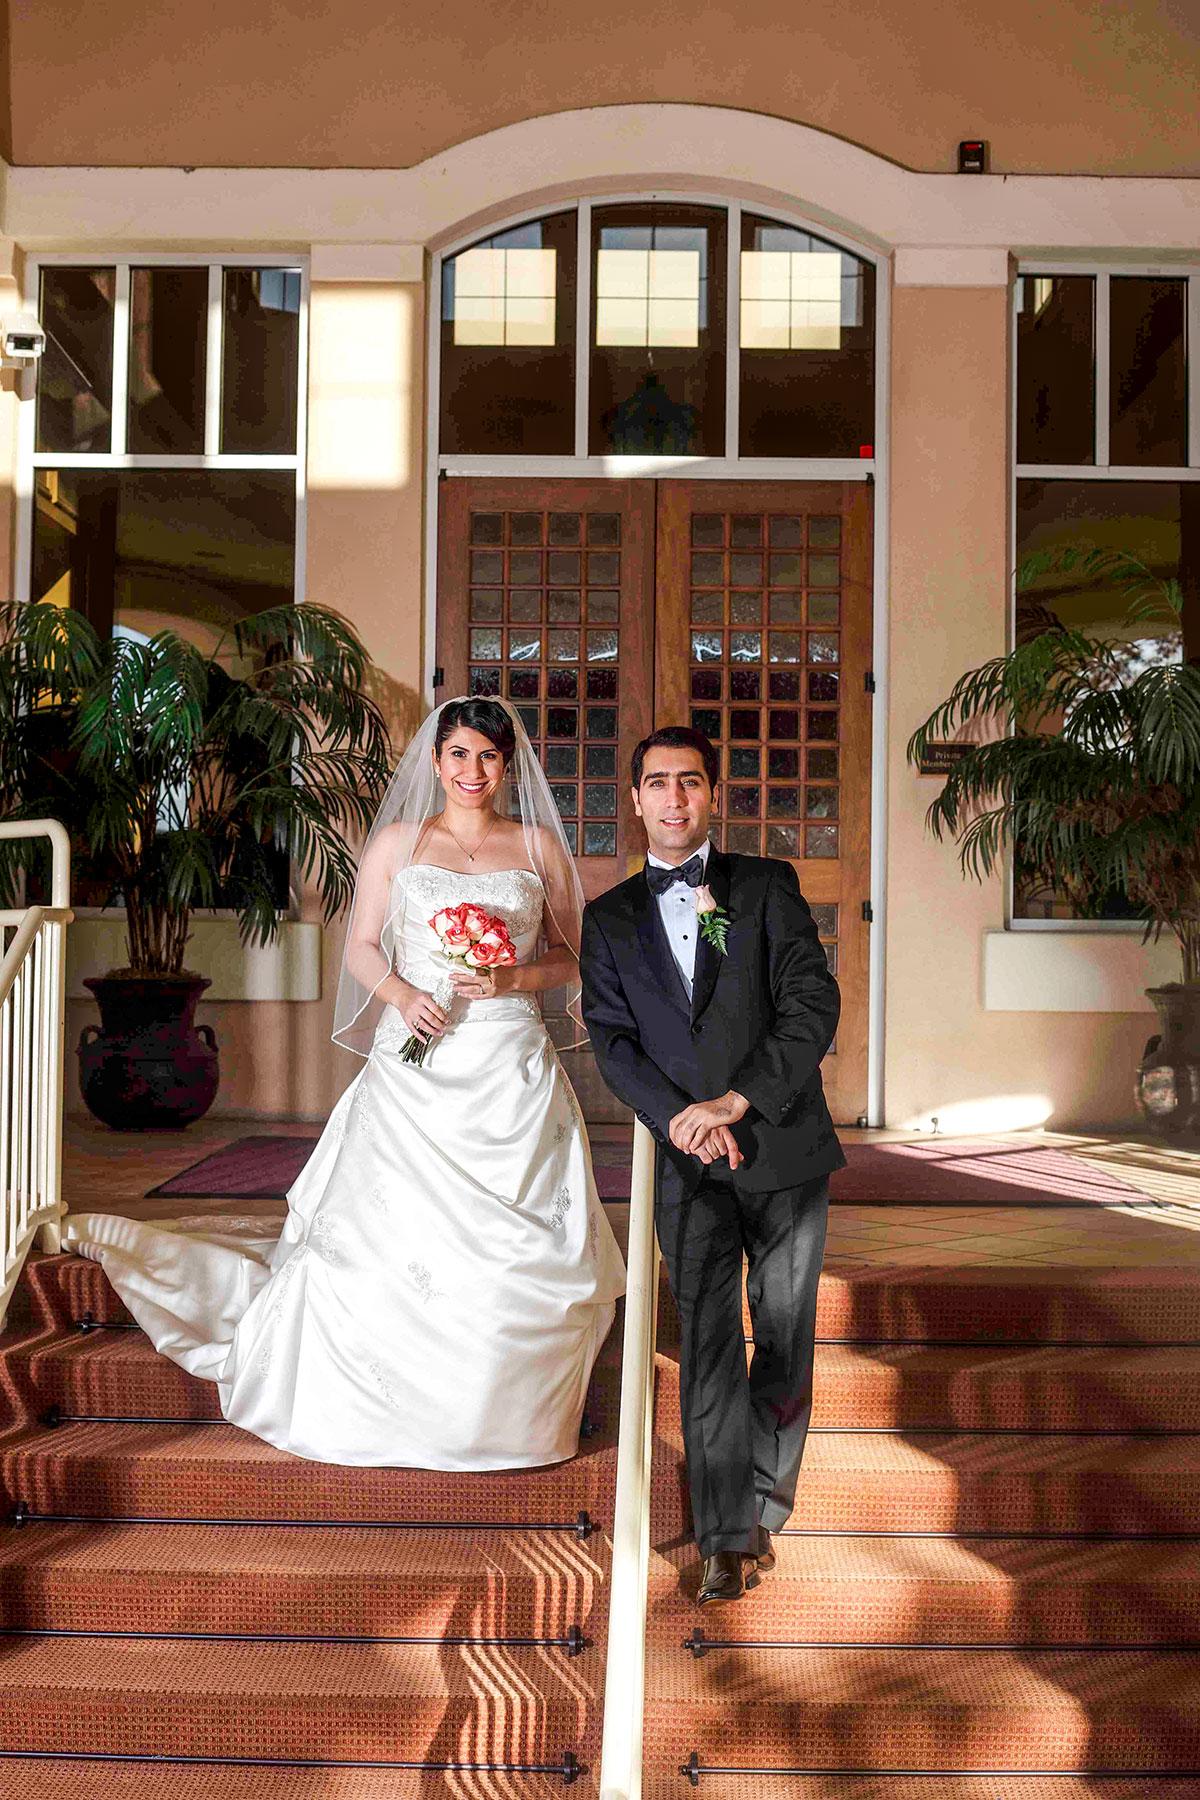 Wedding_Chicago_Anna_Majid_007.jpg